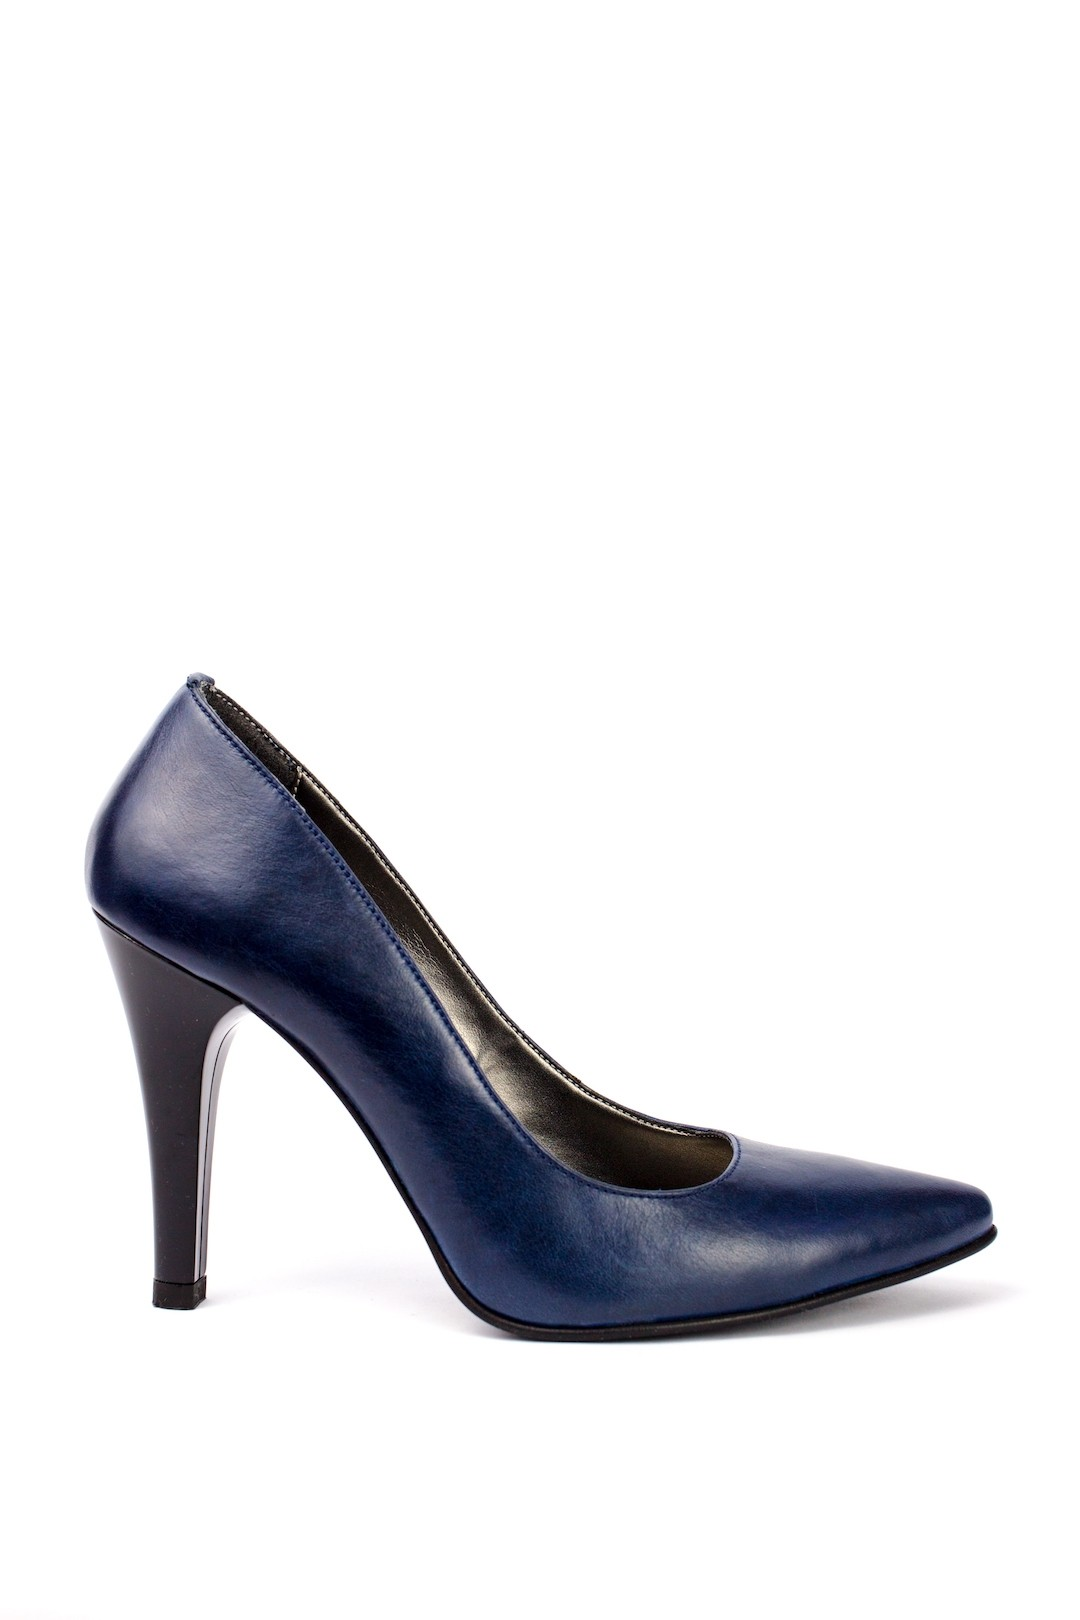 Pantofi Dama piele naturala albastru Lena